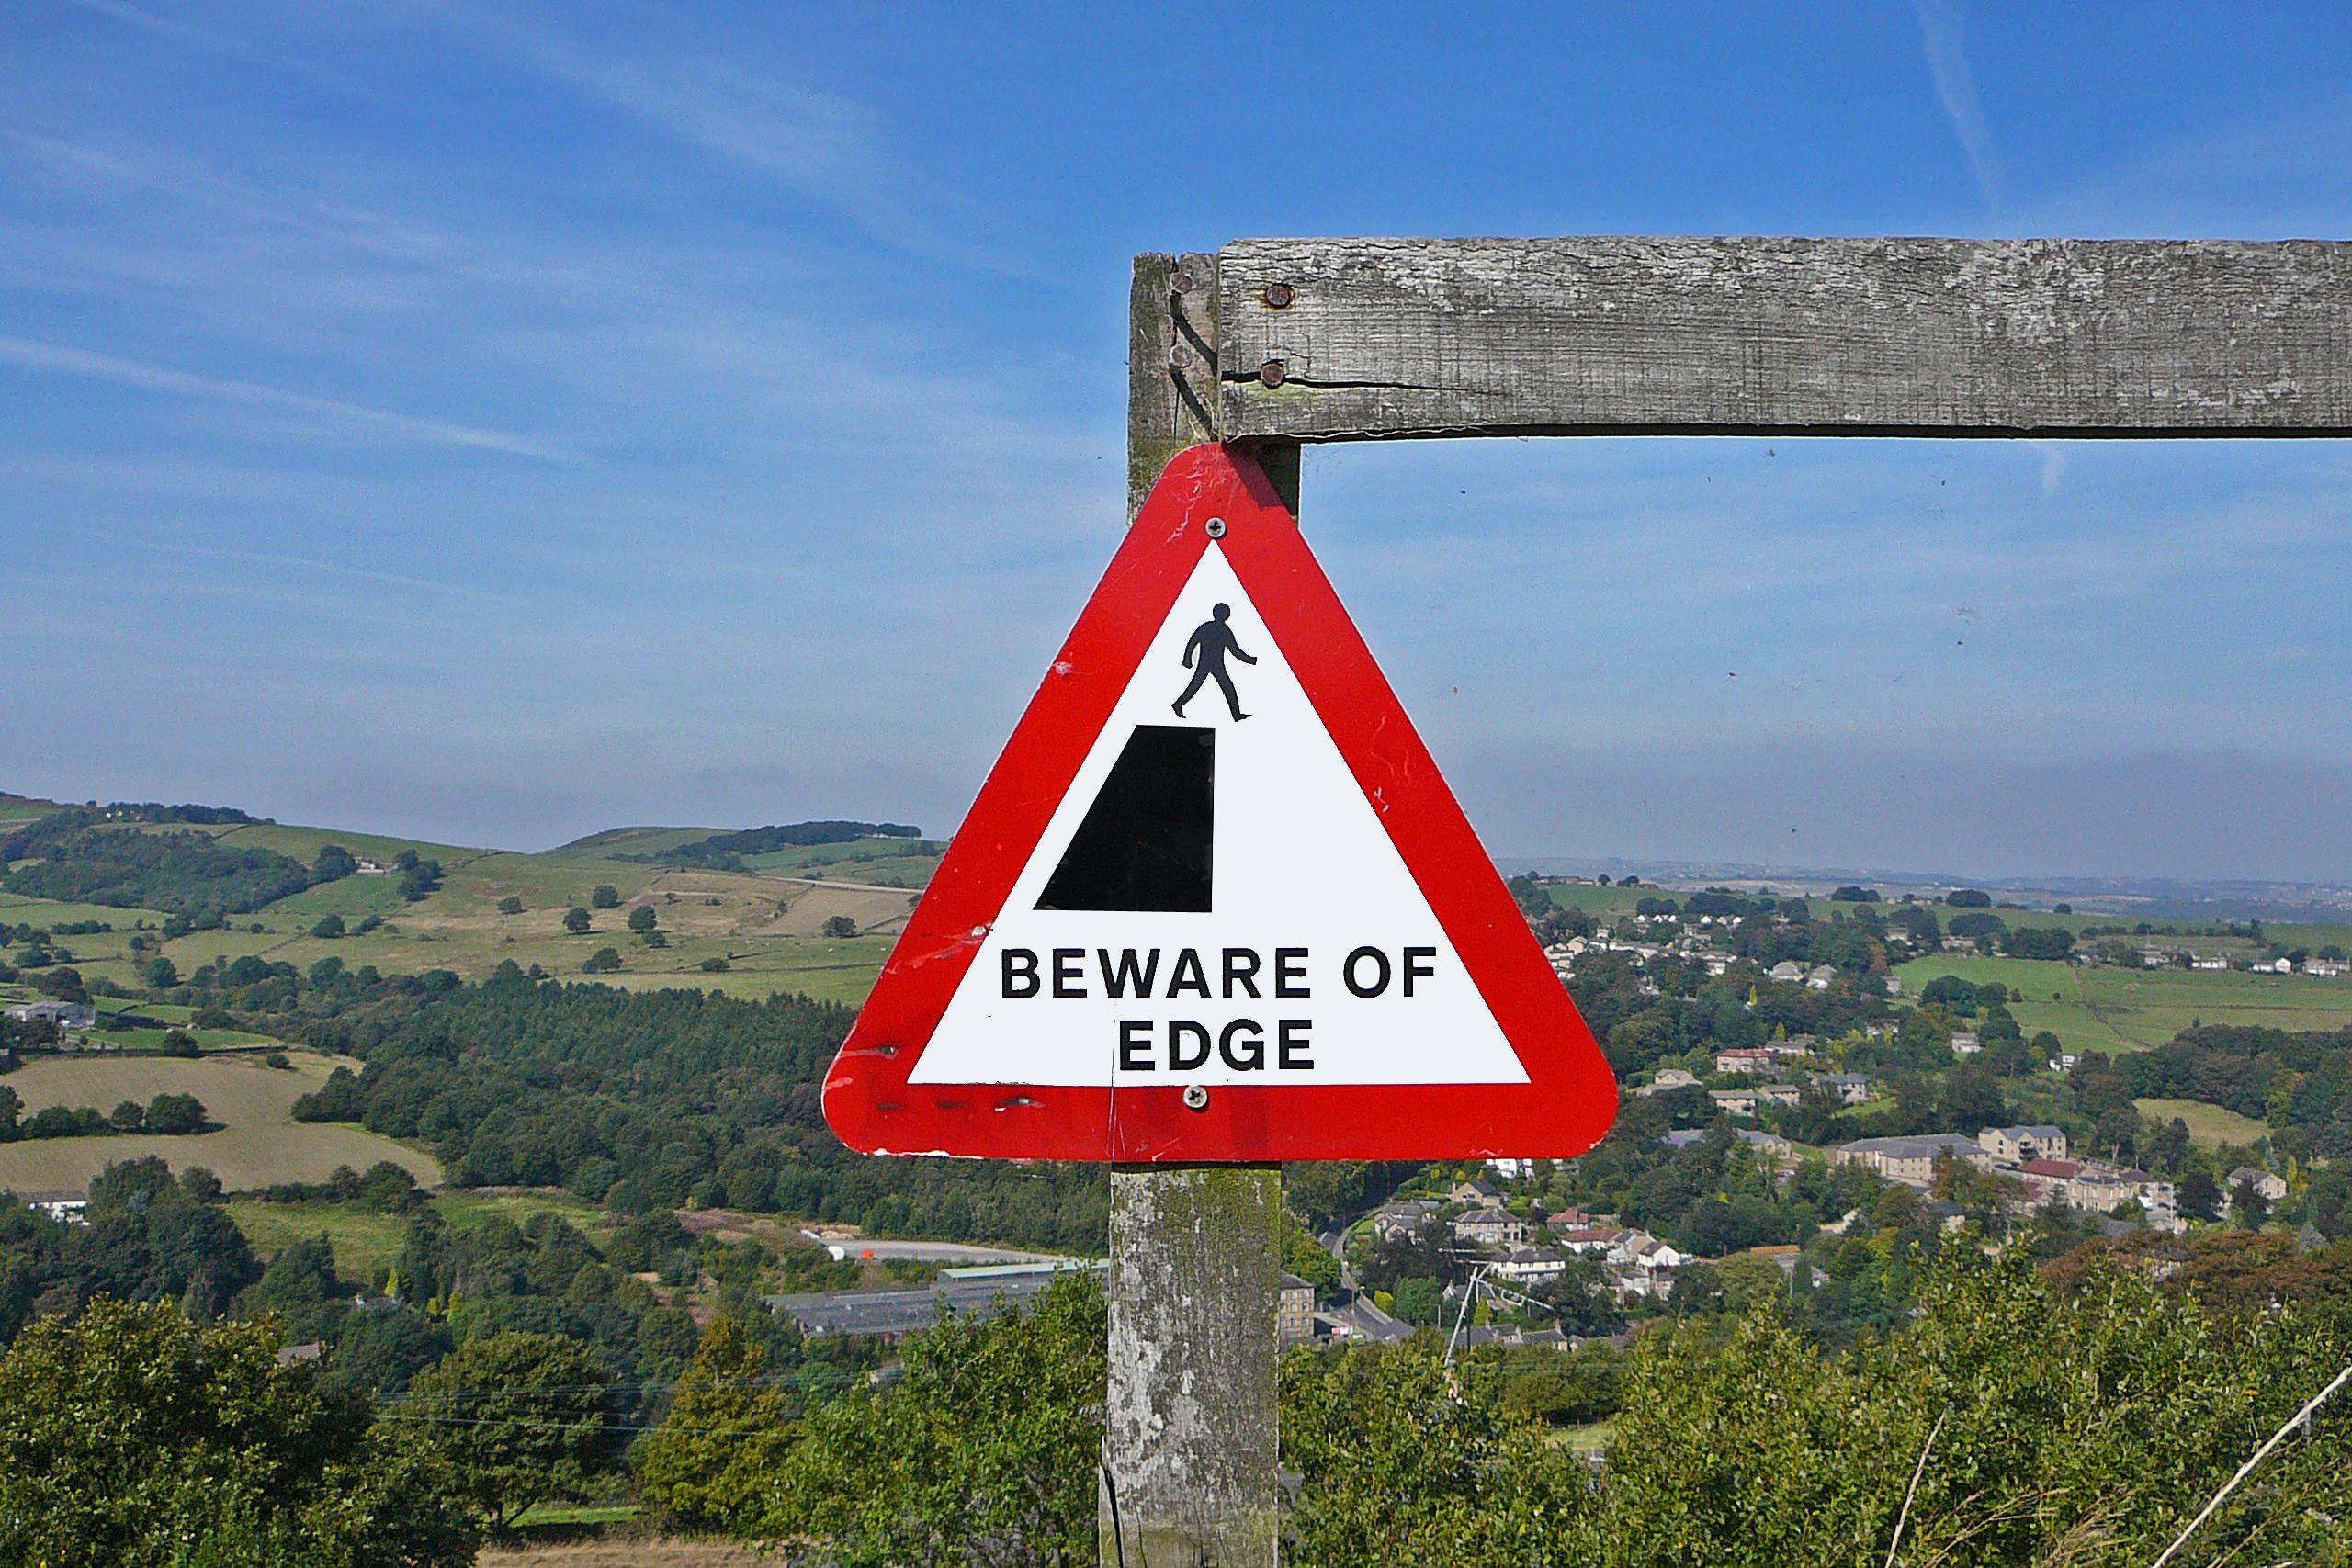 Beware of Edge